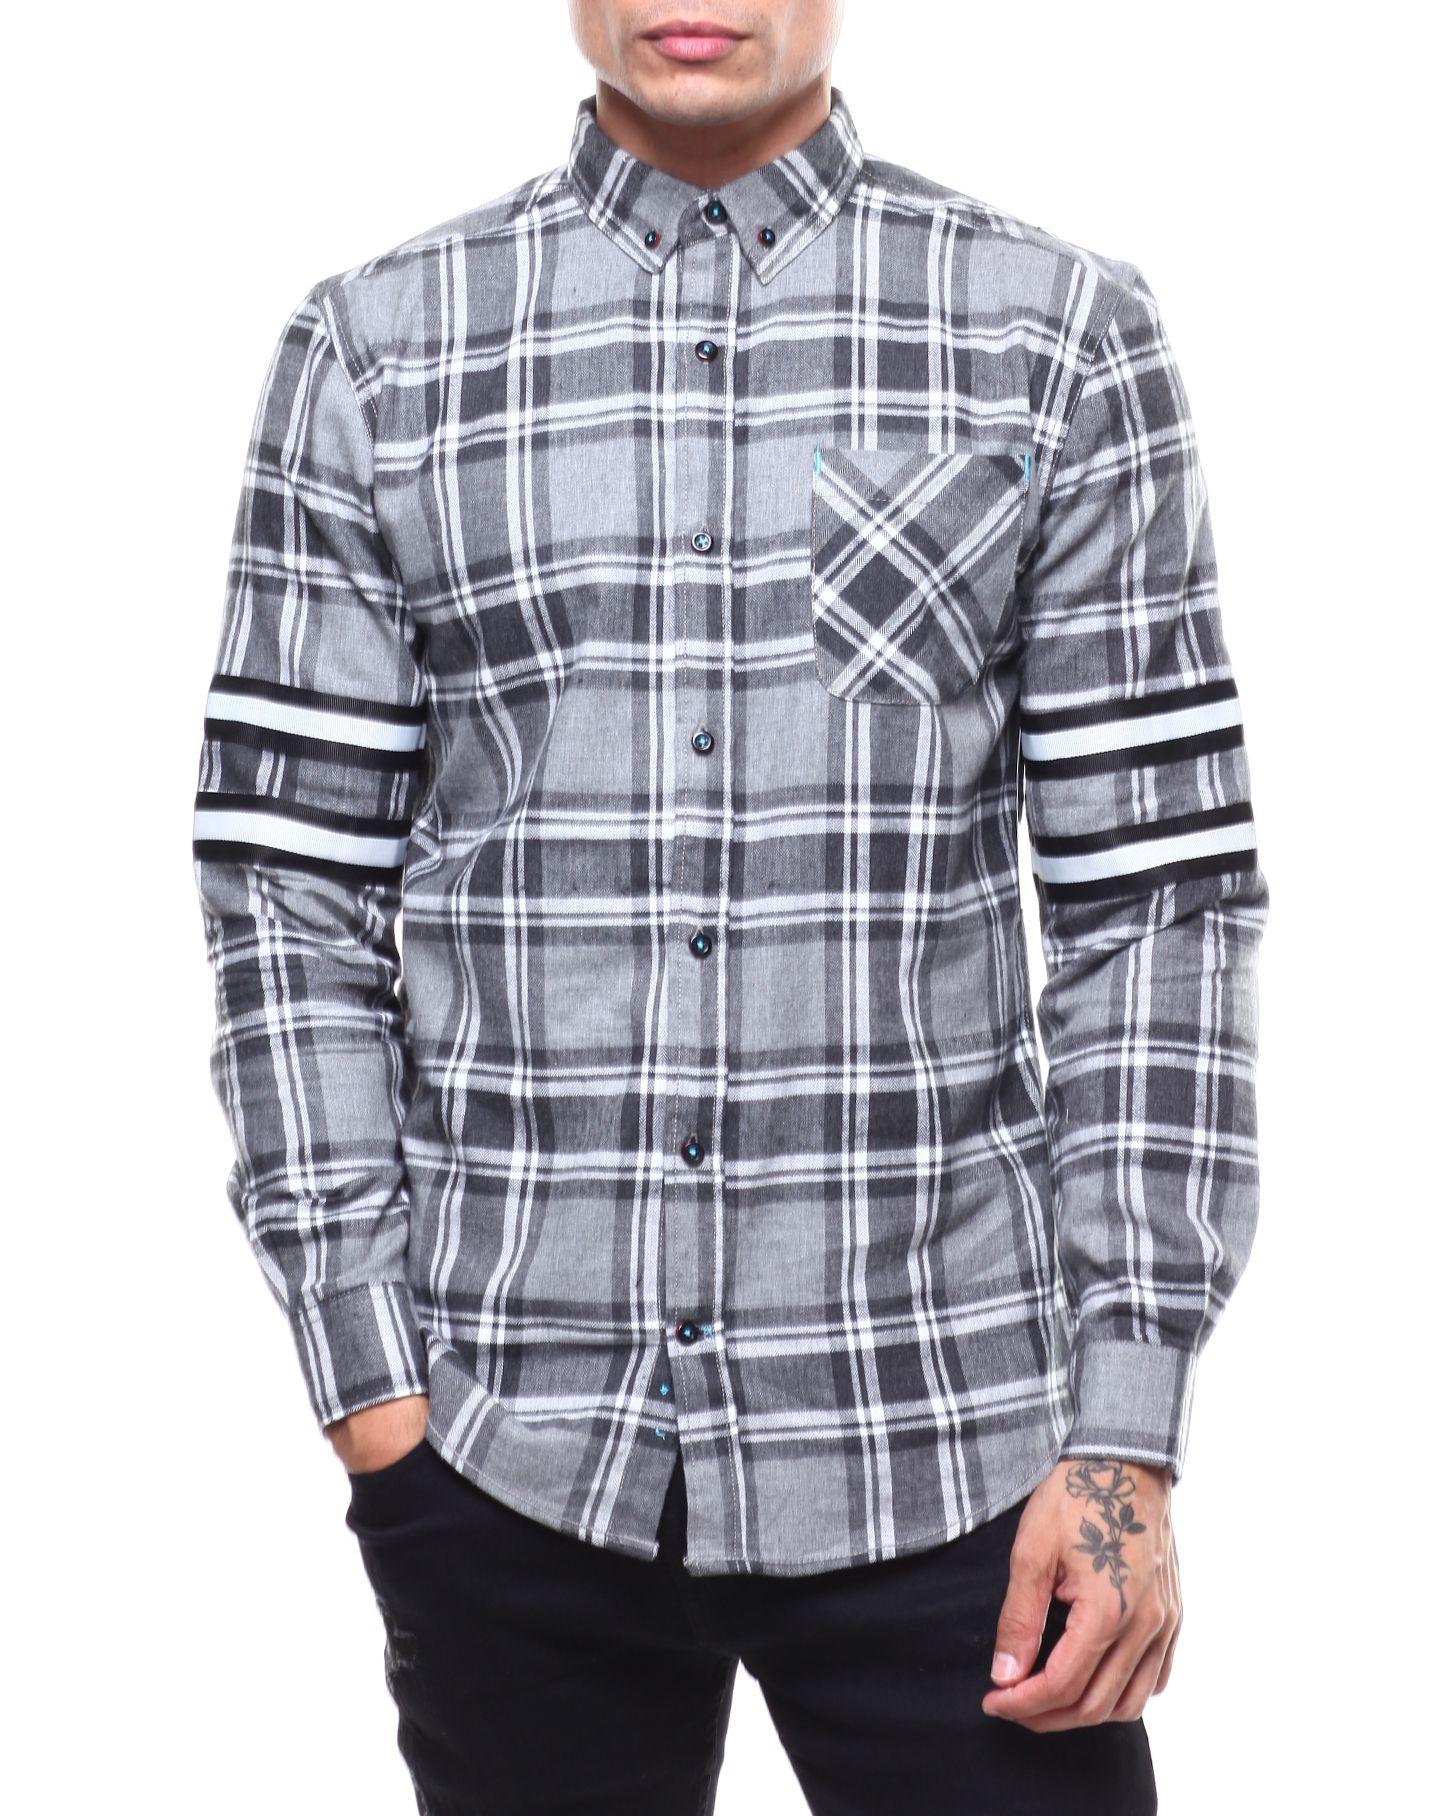 Mens Casual Plaid Patchwork Dress Shirt-Long Sleeve Sherpa Lined Shirt Top Blouse